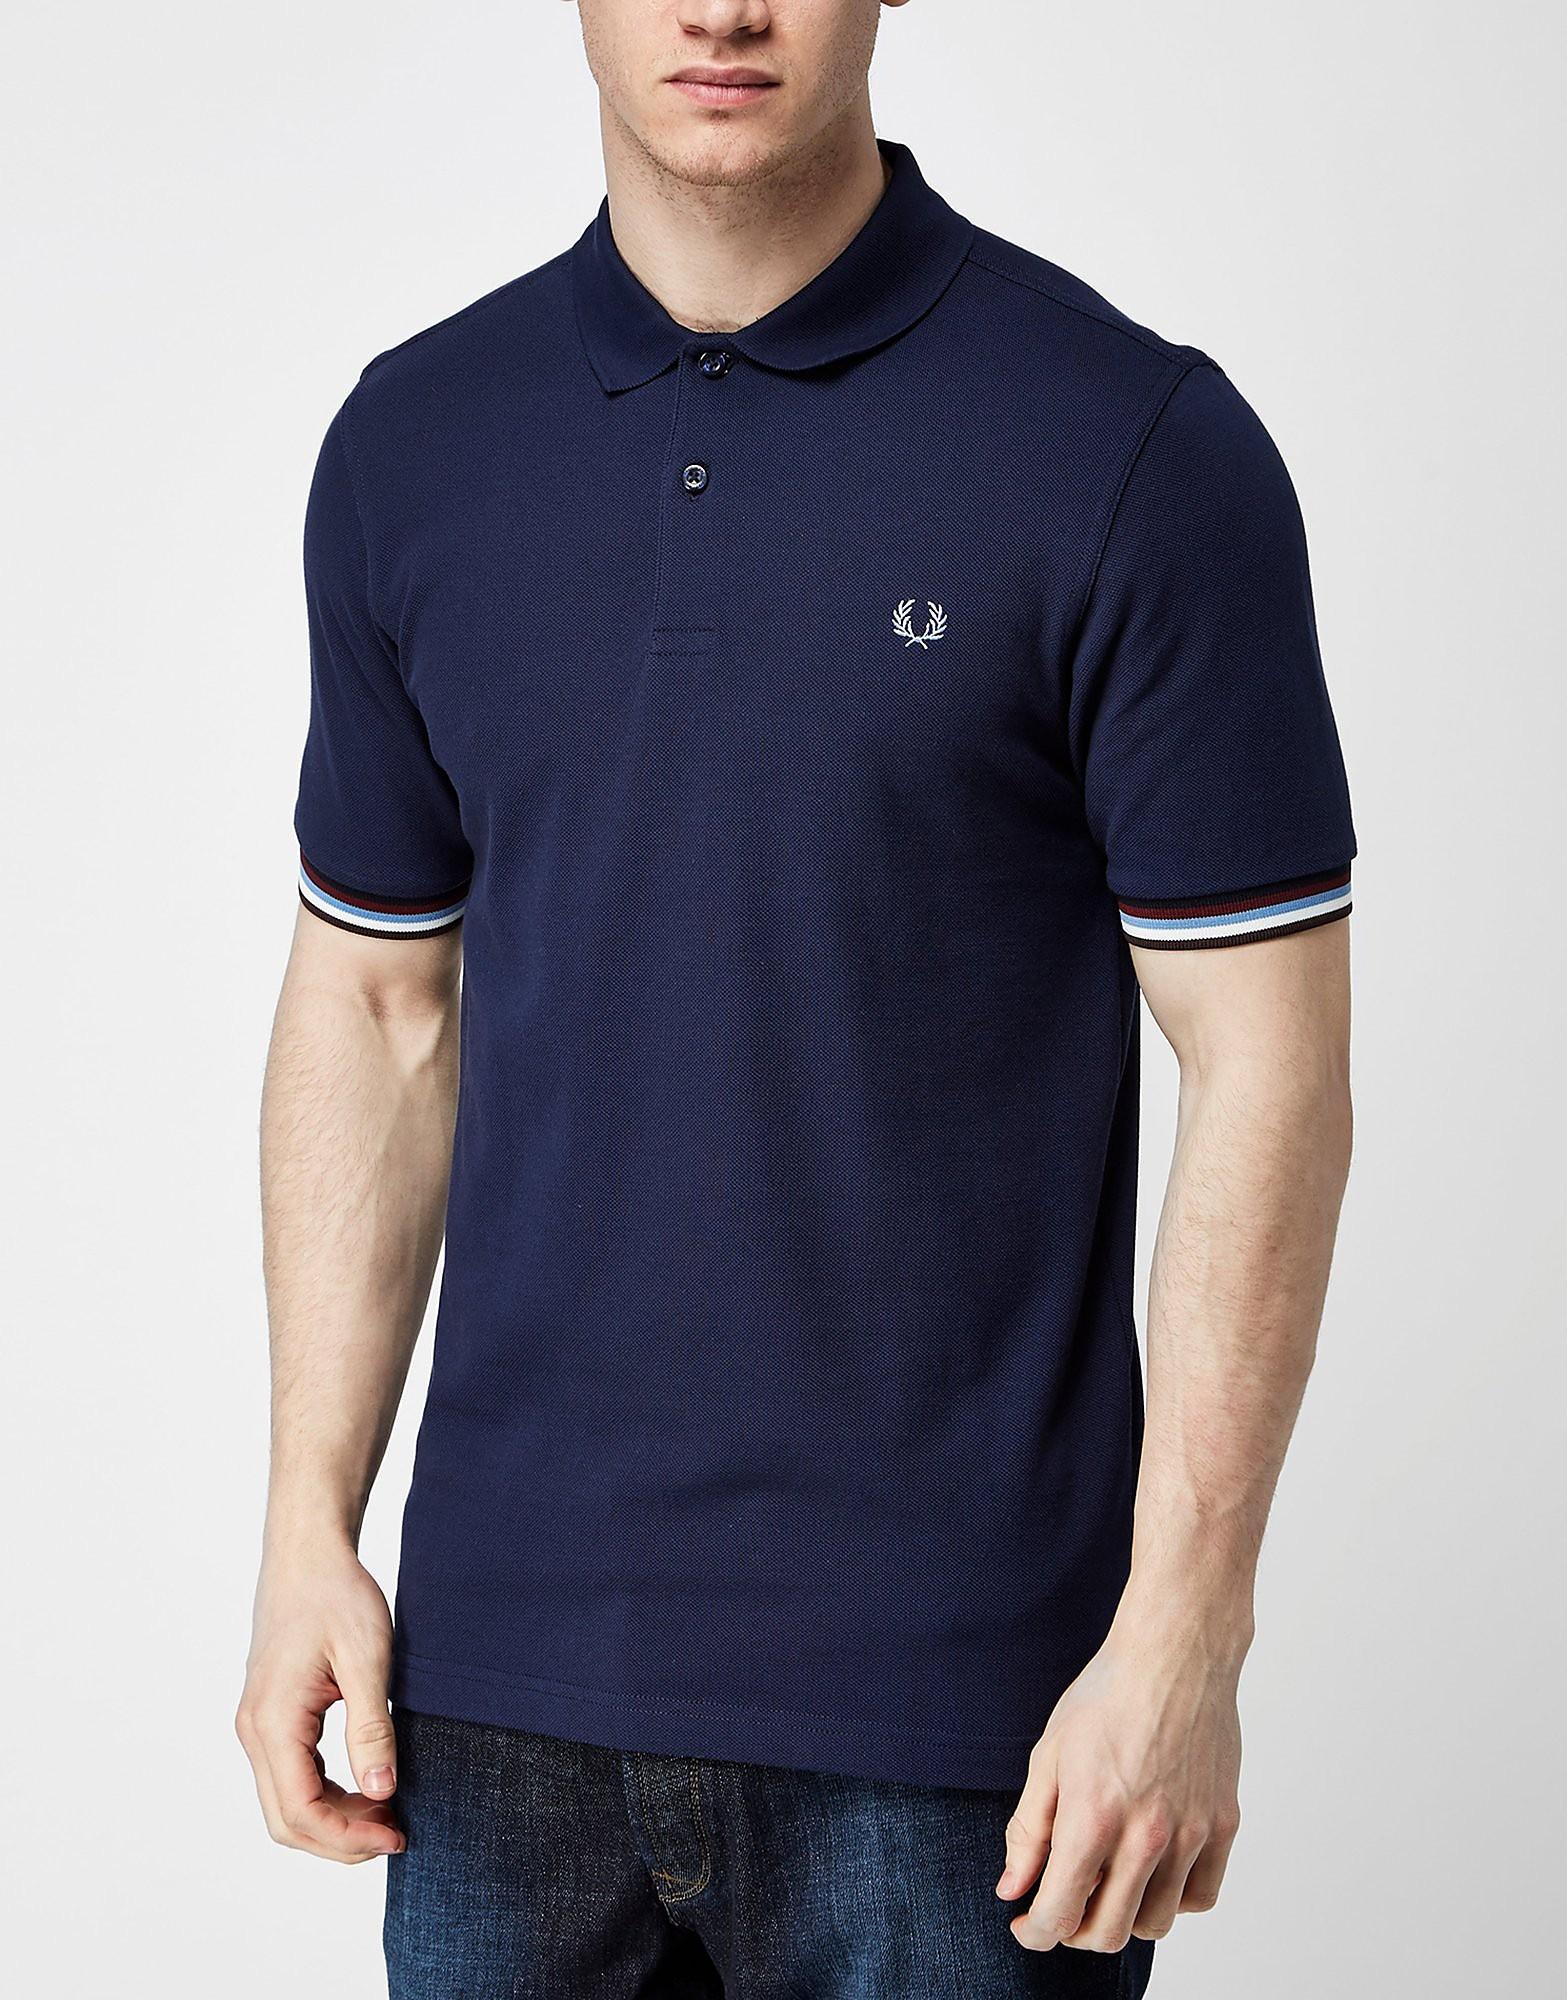 Fred Perry Bradley Wiggins Stripe Cuff Polo Shirt  Navy Navy